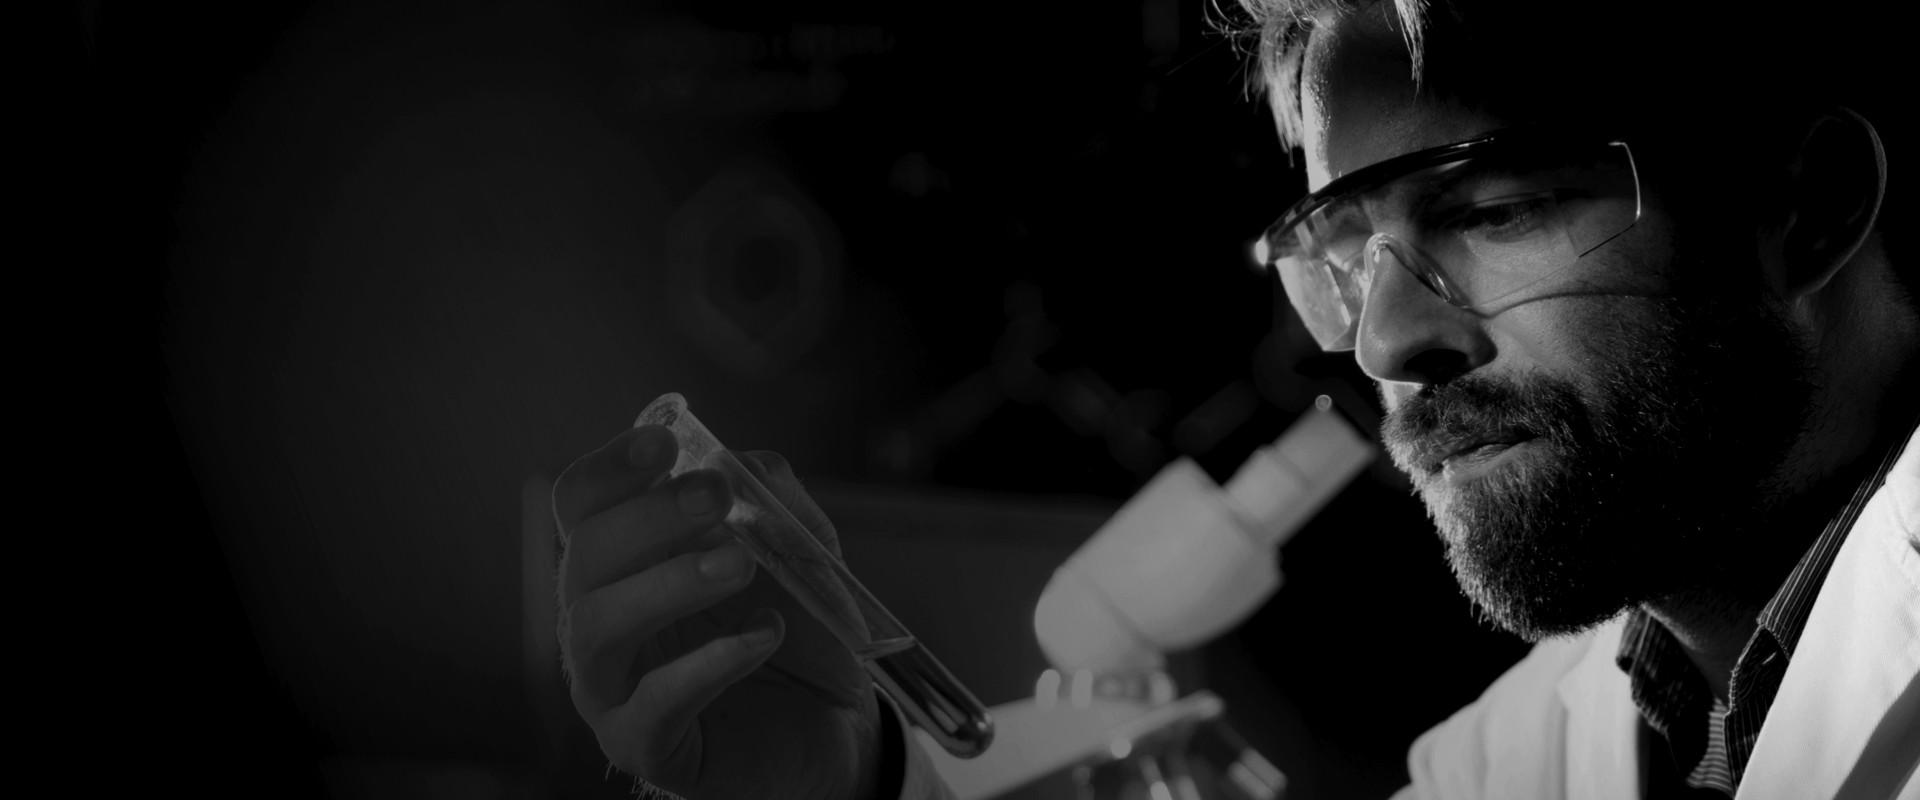 metaflo solidification liquid waste canada US australia new zealand